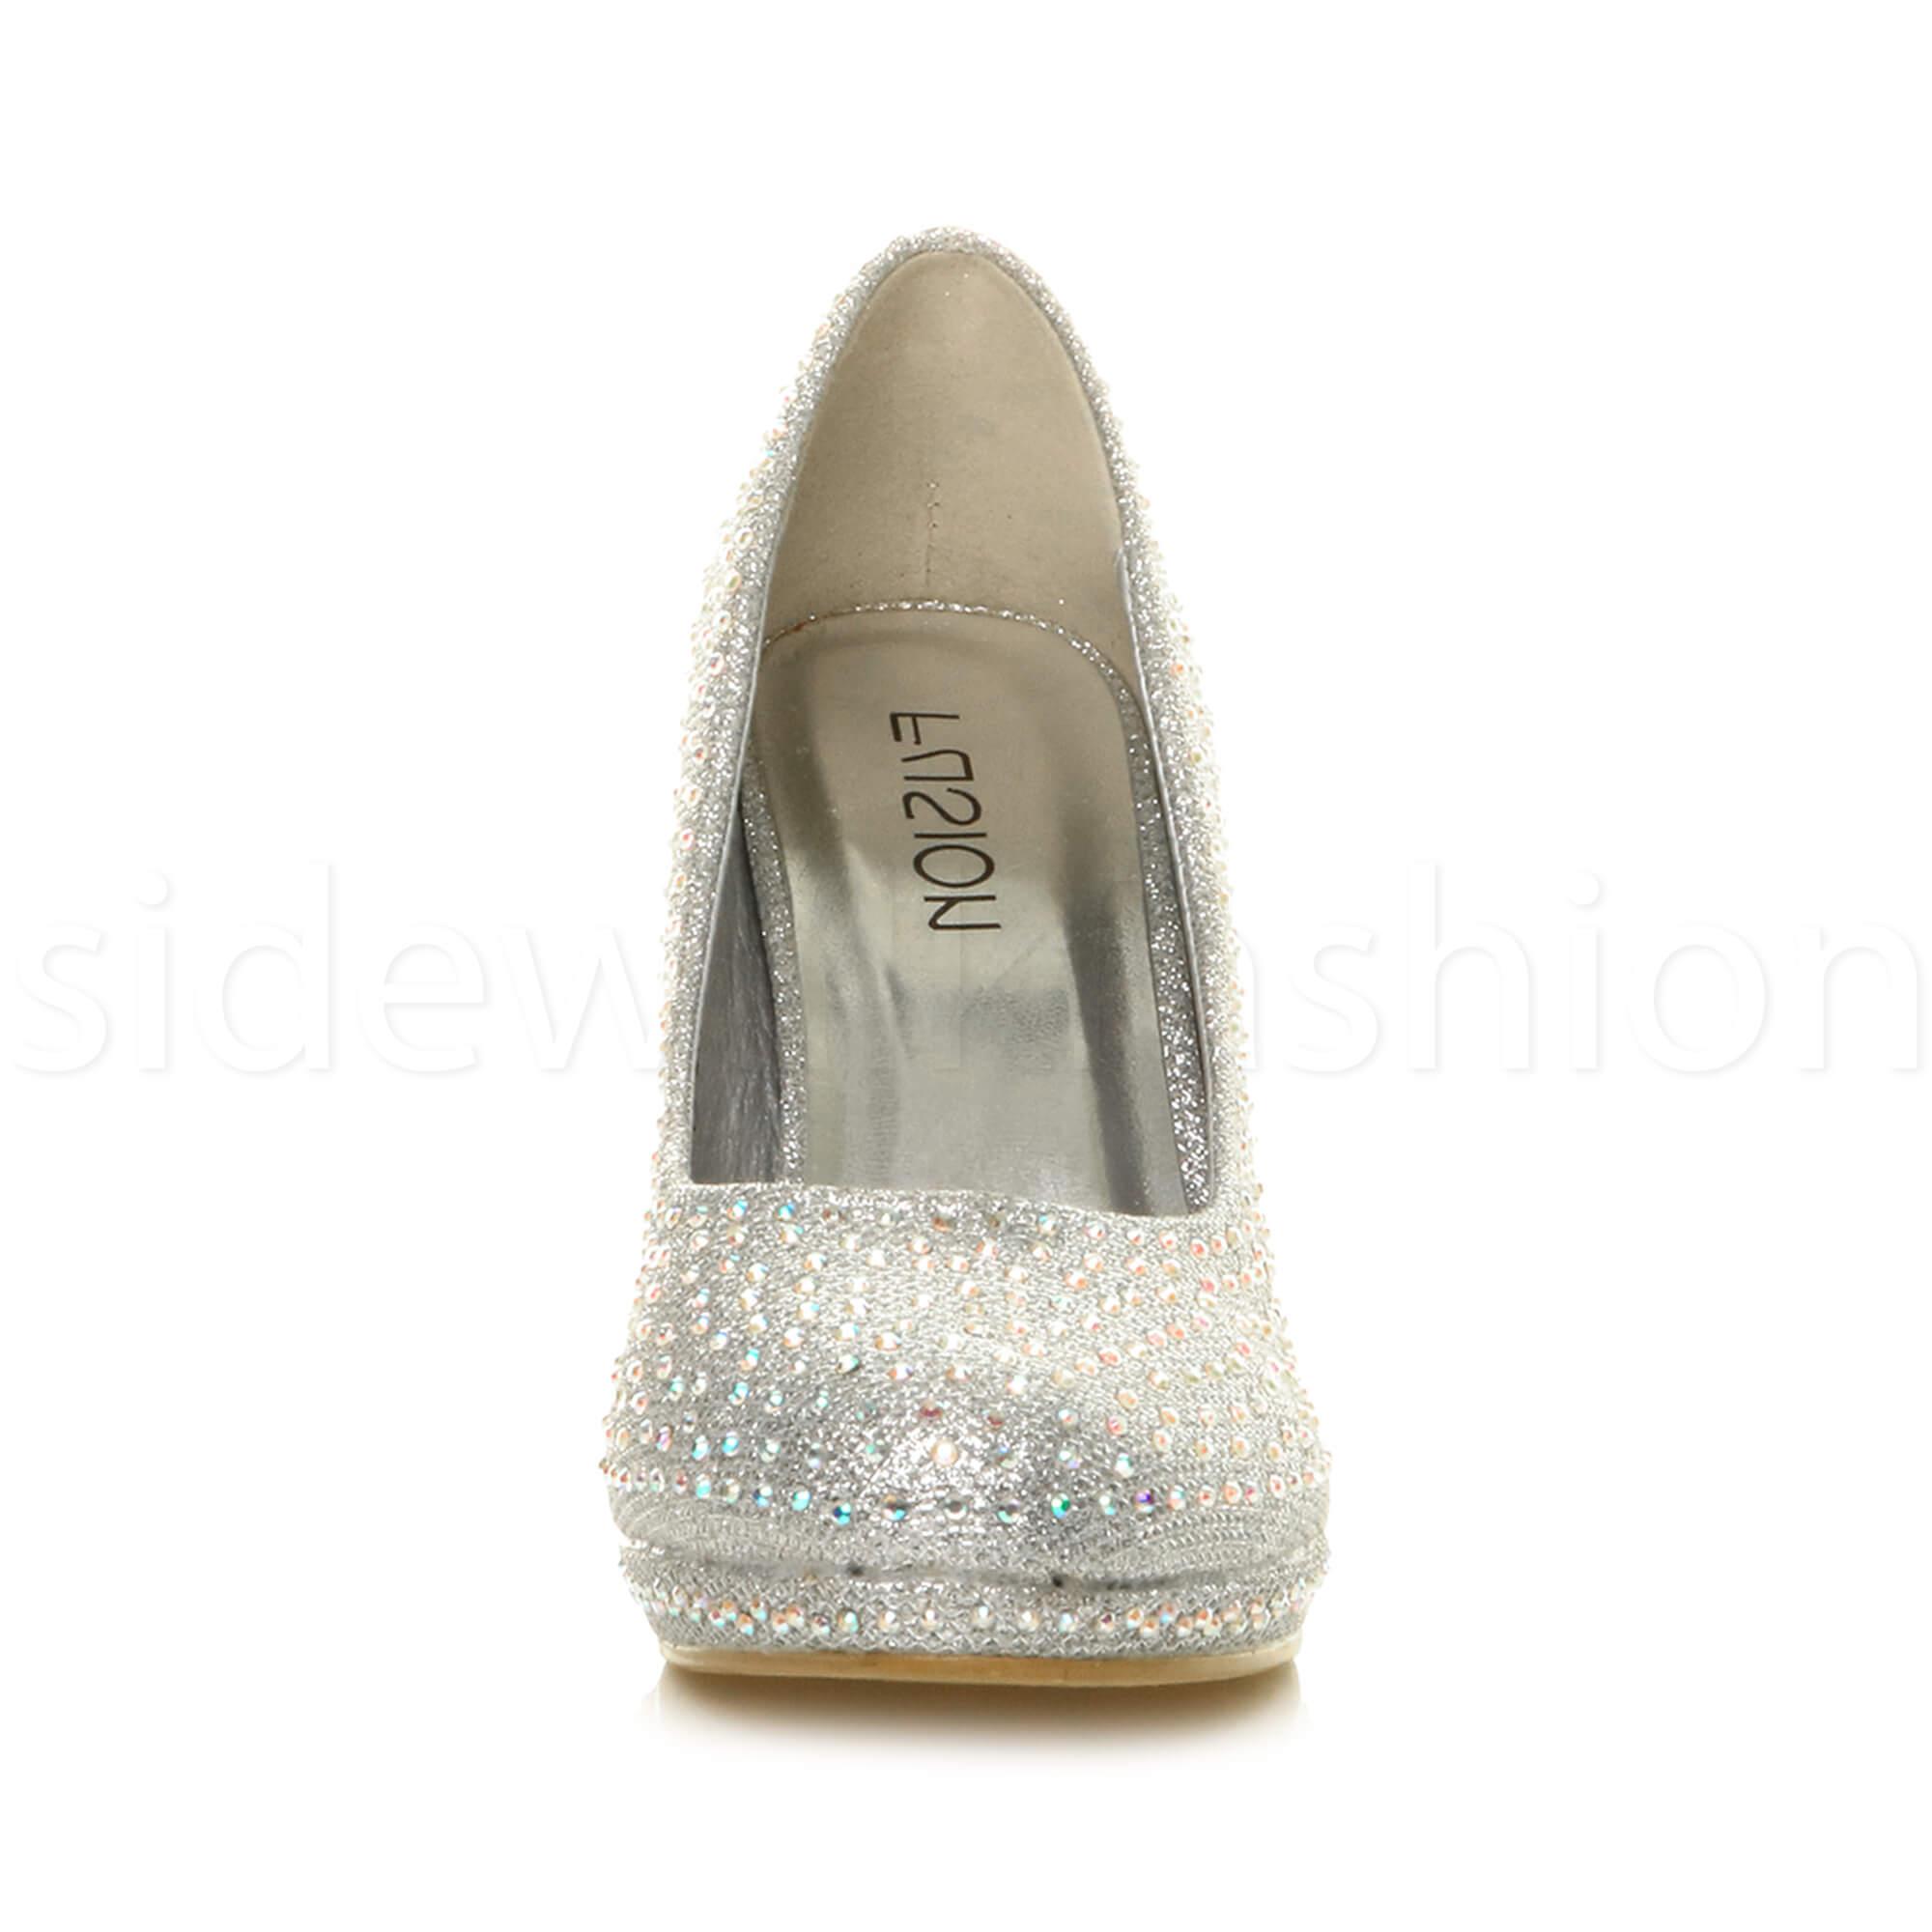 Womens-ladies-high-mid-heel-platform-wedding-evening-bridesmaid-court-shoes-size thumbnail 181